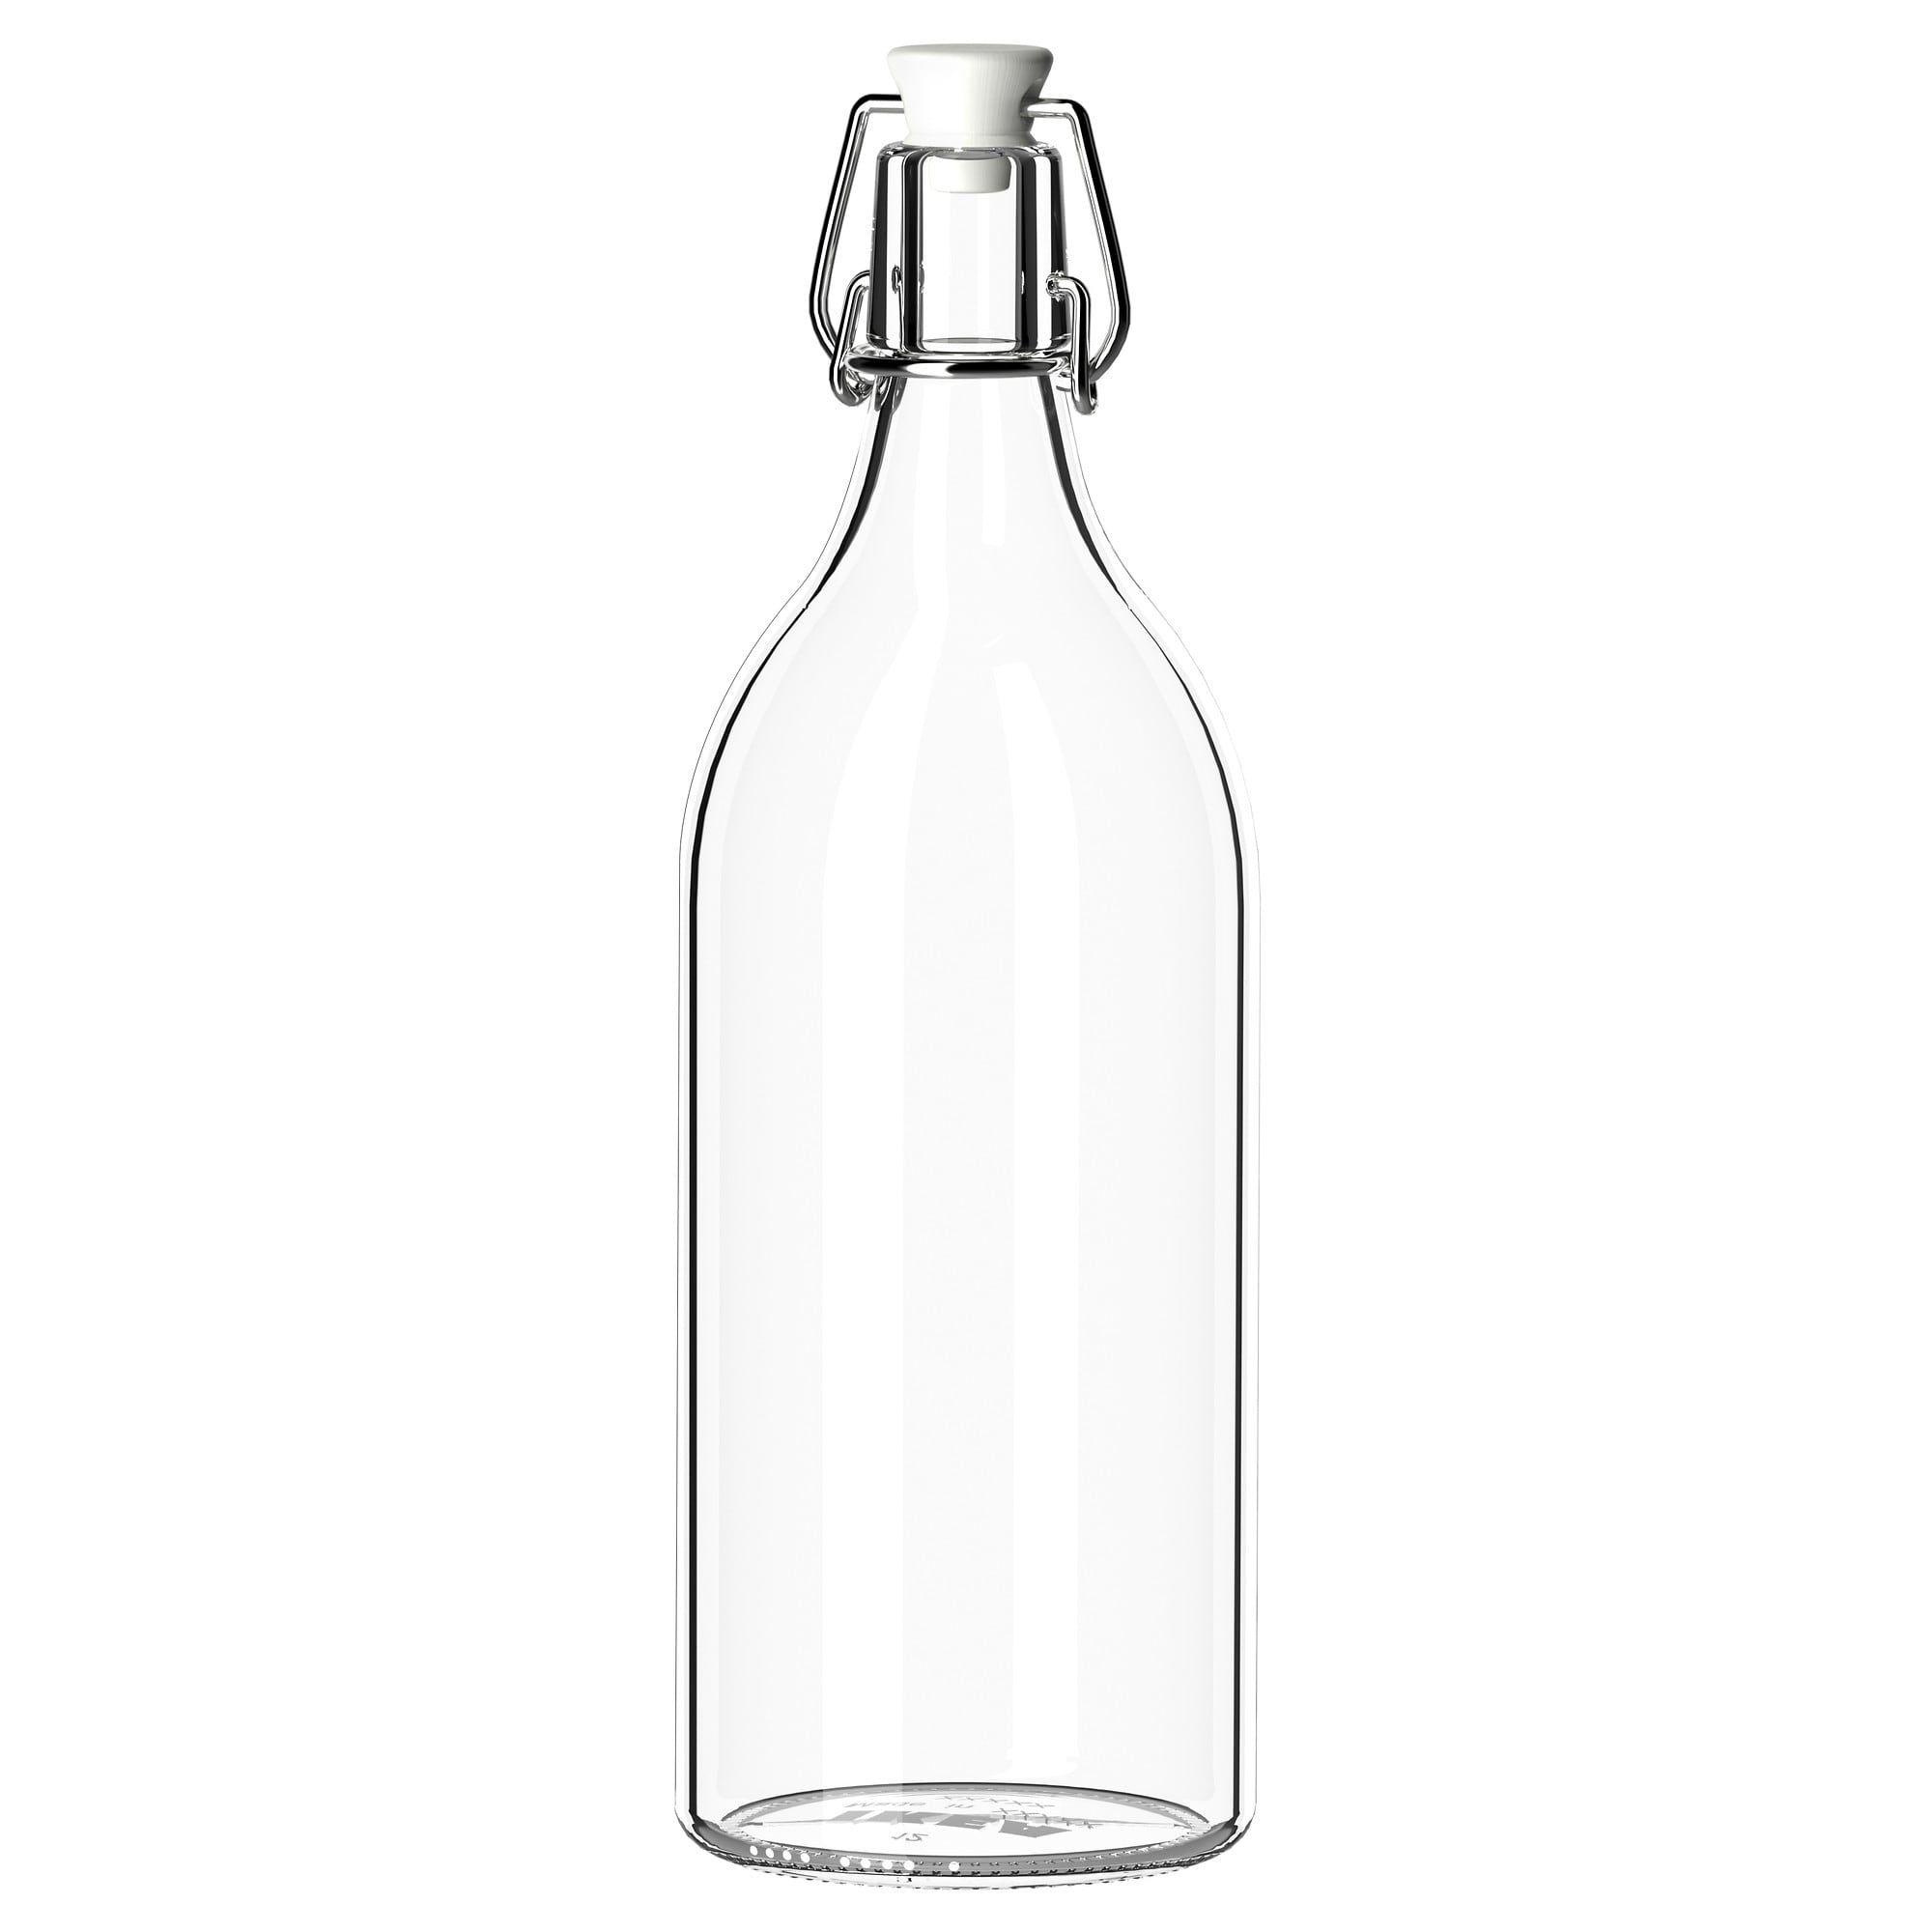 Korken Bottle With Stopper Clear Glass Height 11 Diameter 4 Ikea Bottle Glass Stopper Clear Glass